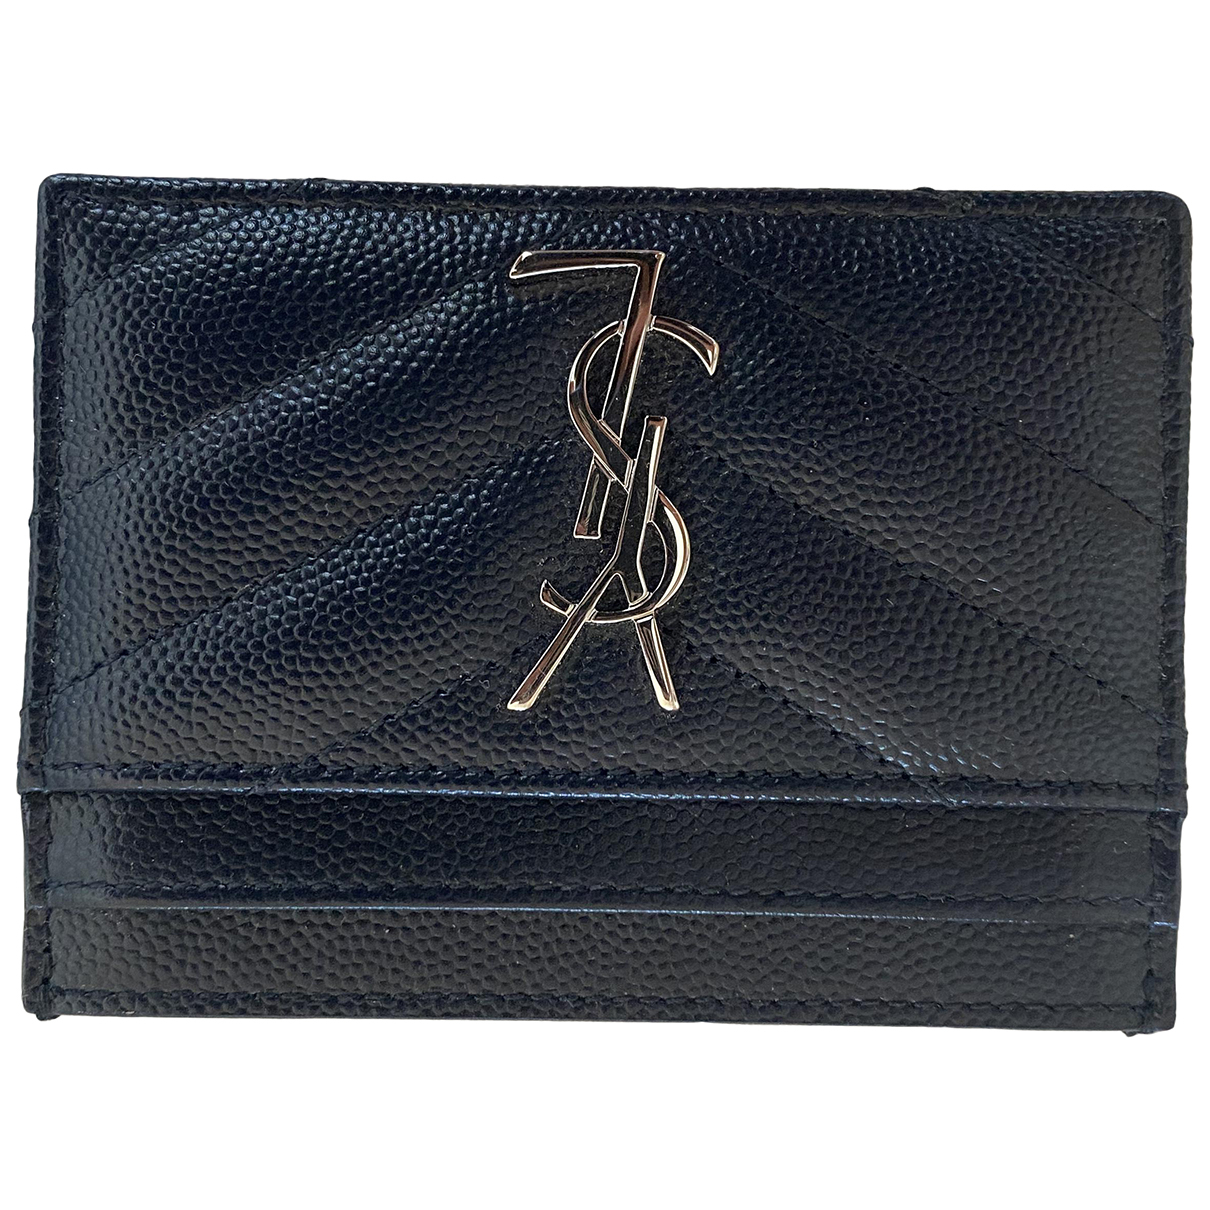 Saint Laurent Monogramme Navy Leather Purses, wallet & cases for Women \N